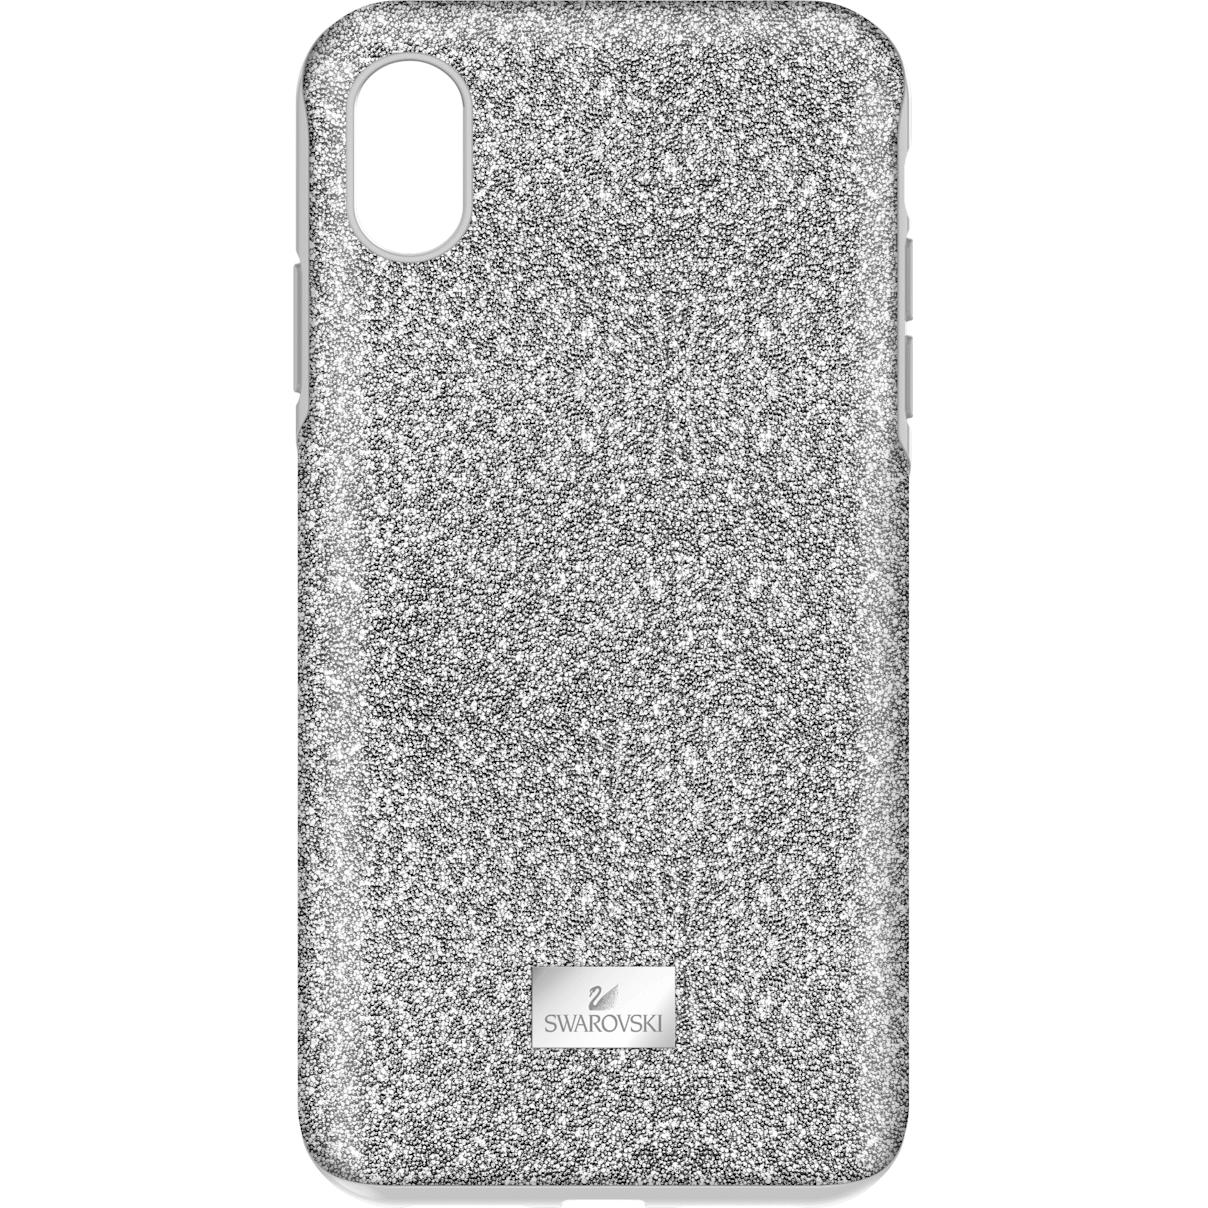 Swarovski High Smartphone Case with Bumper, iPhone® XS Max, Silver tone